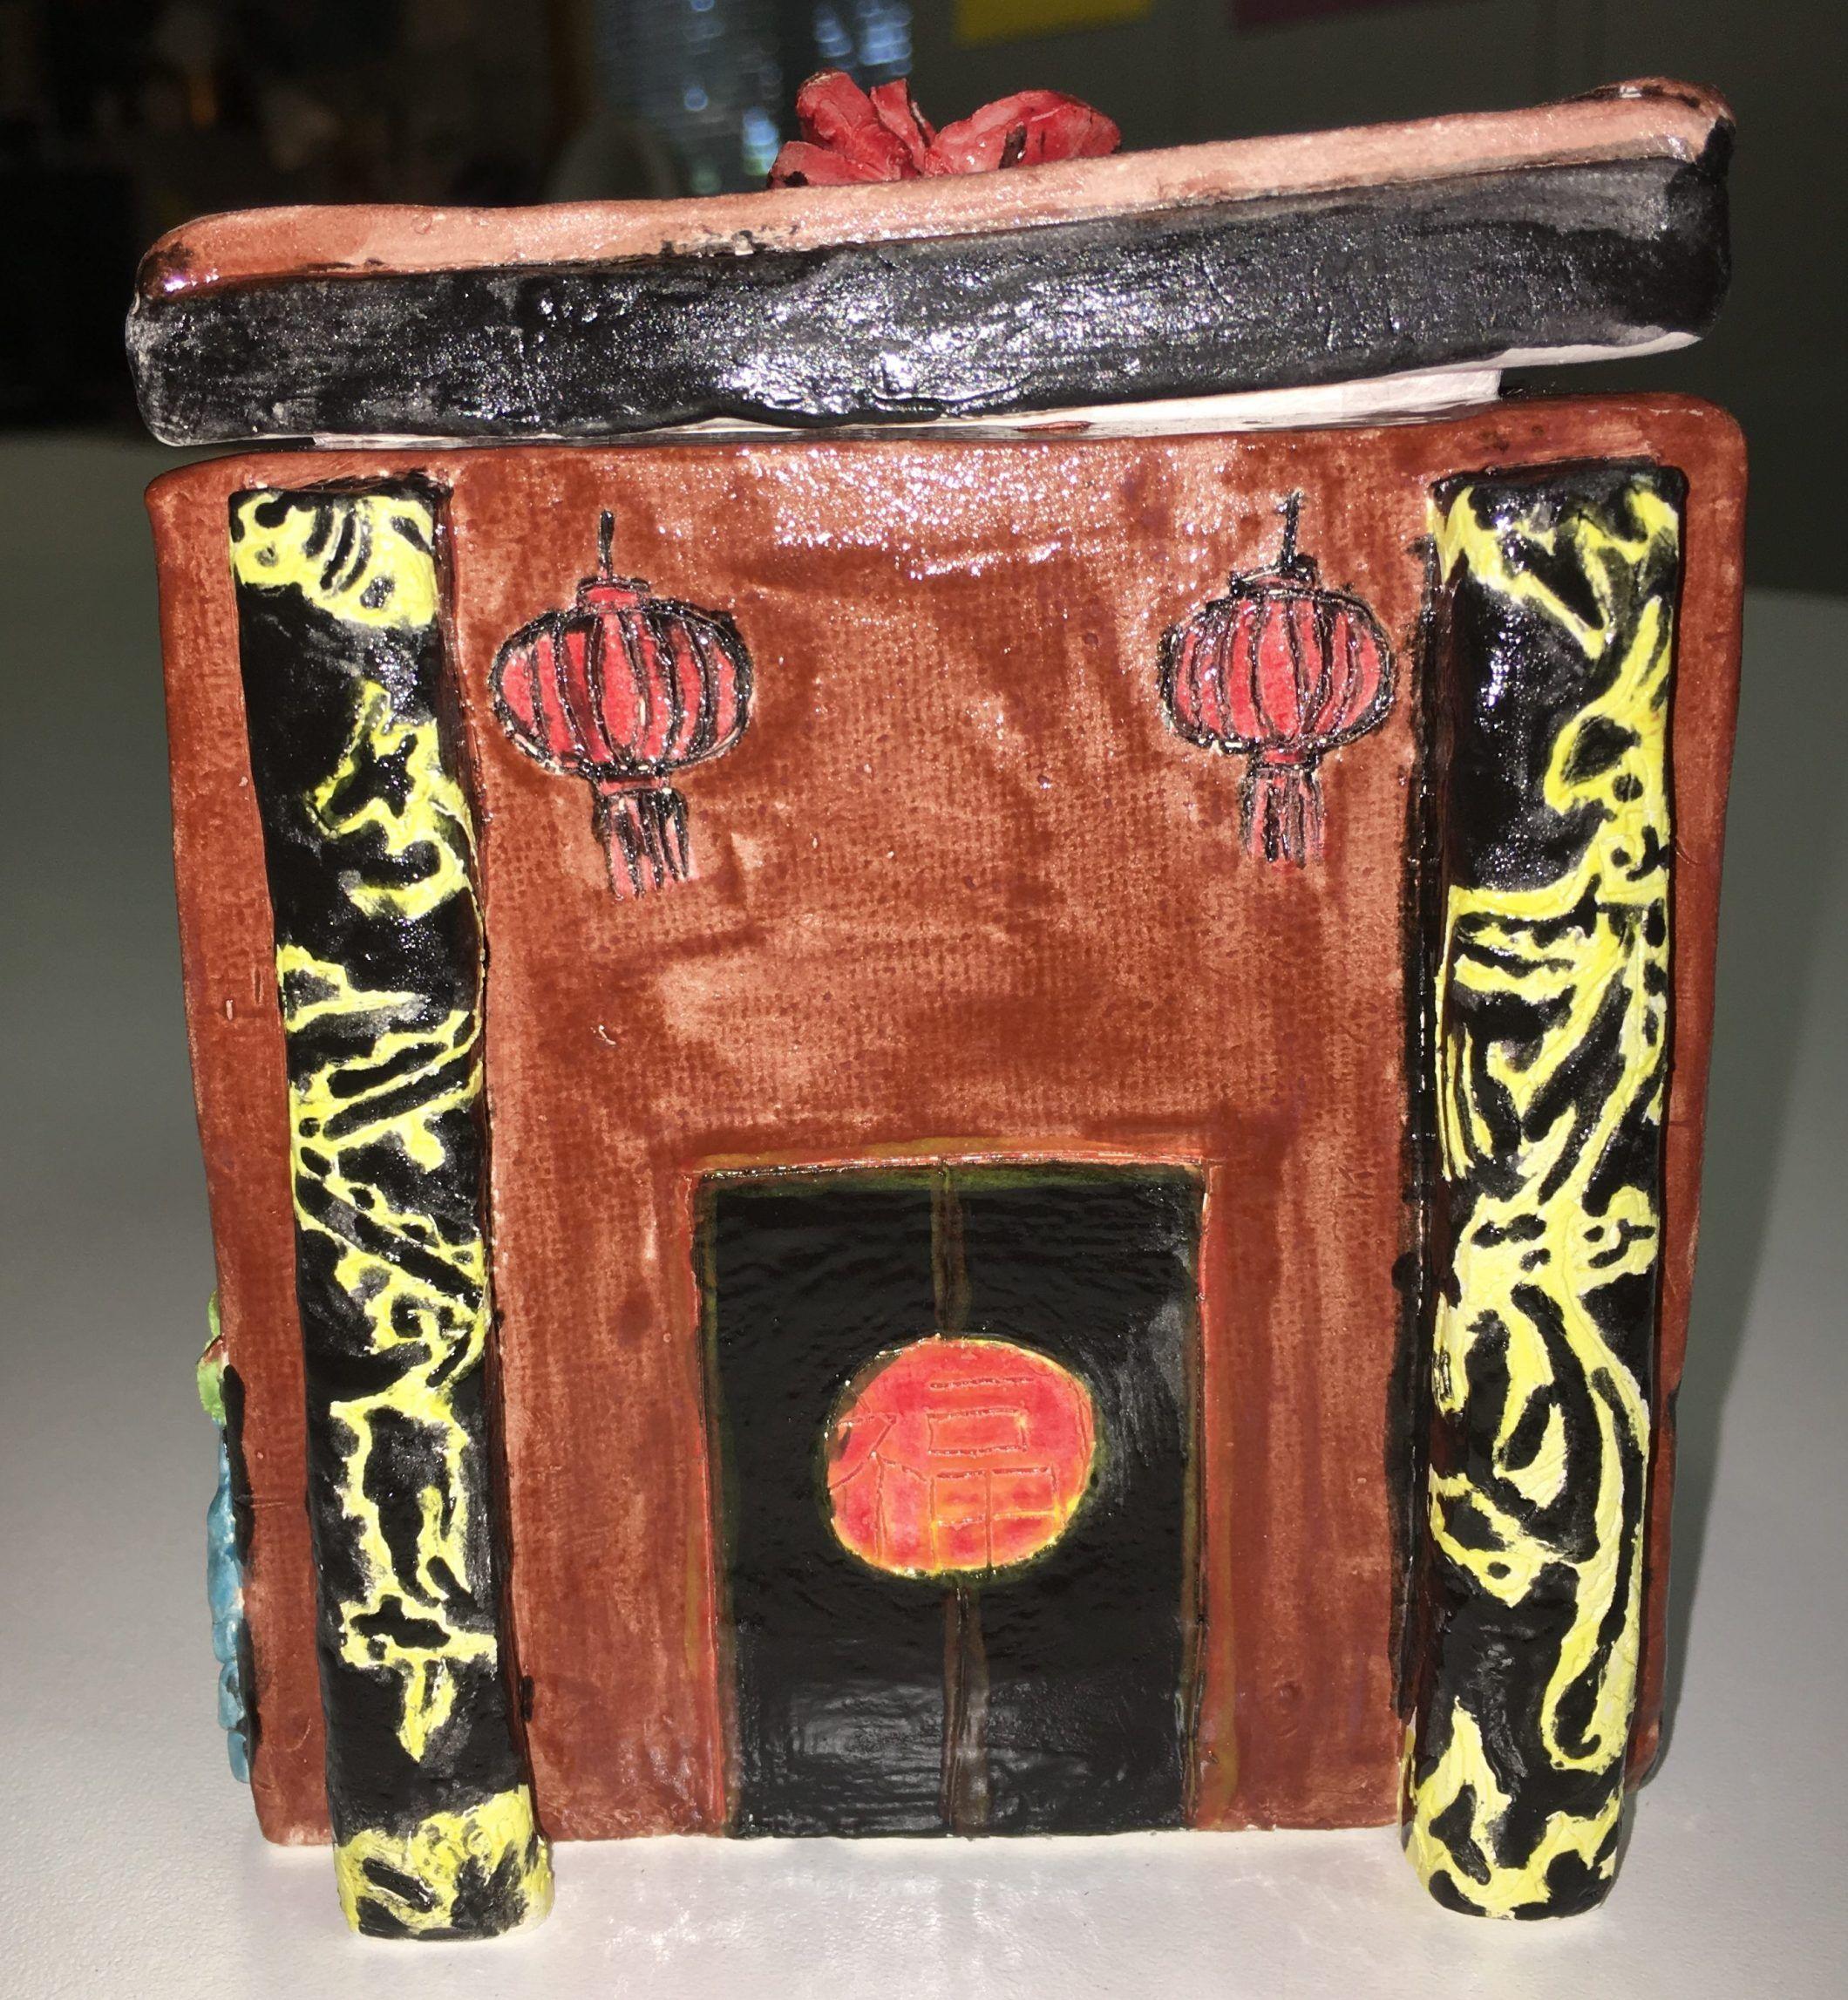 Ceramic Box With Lid Lesson Art Room Rules Ceramic Boxes Art Lesson Plans